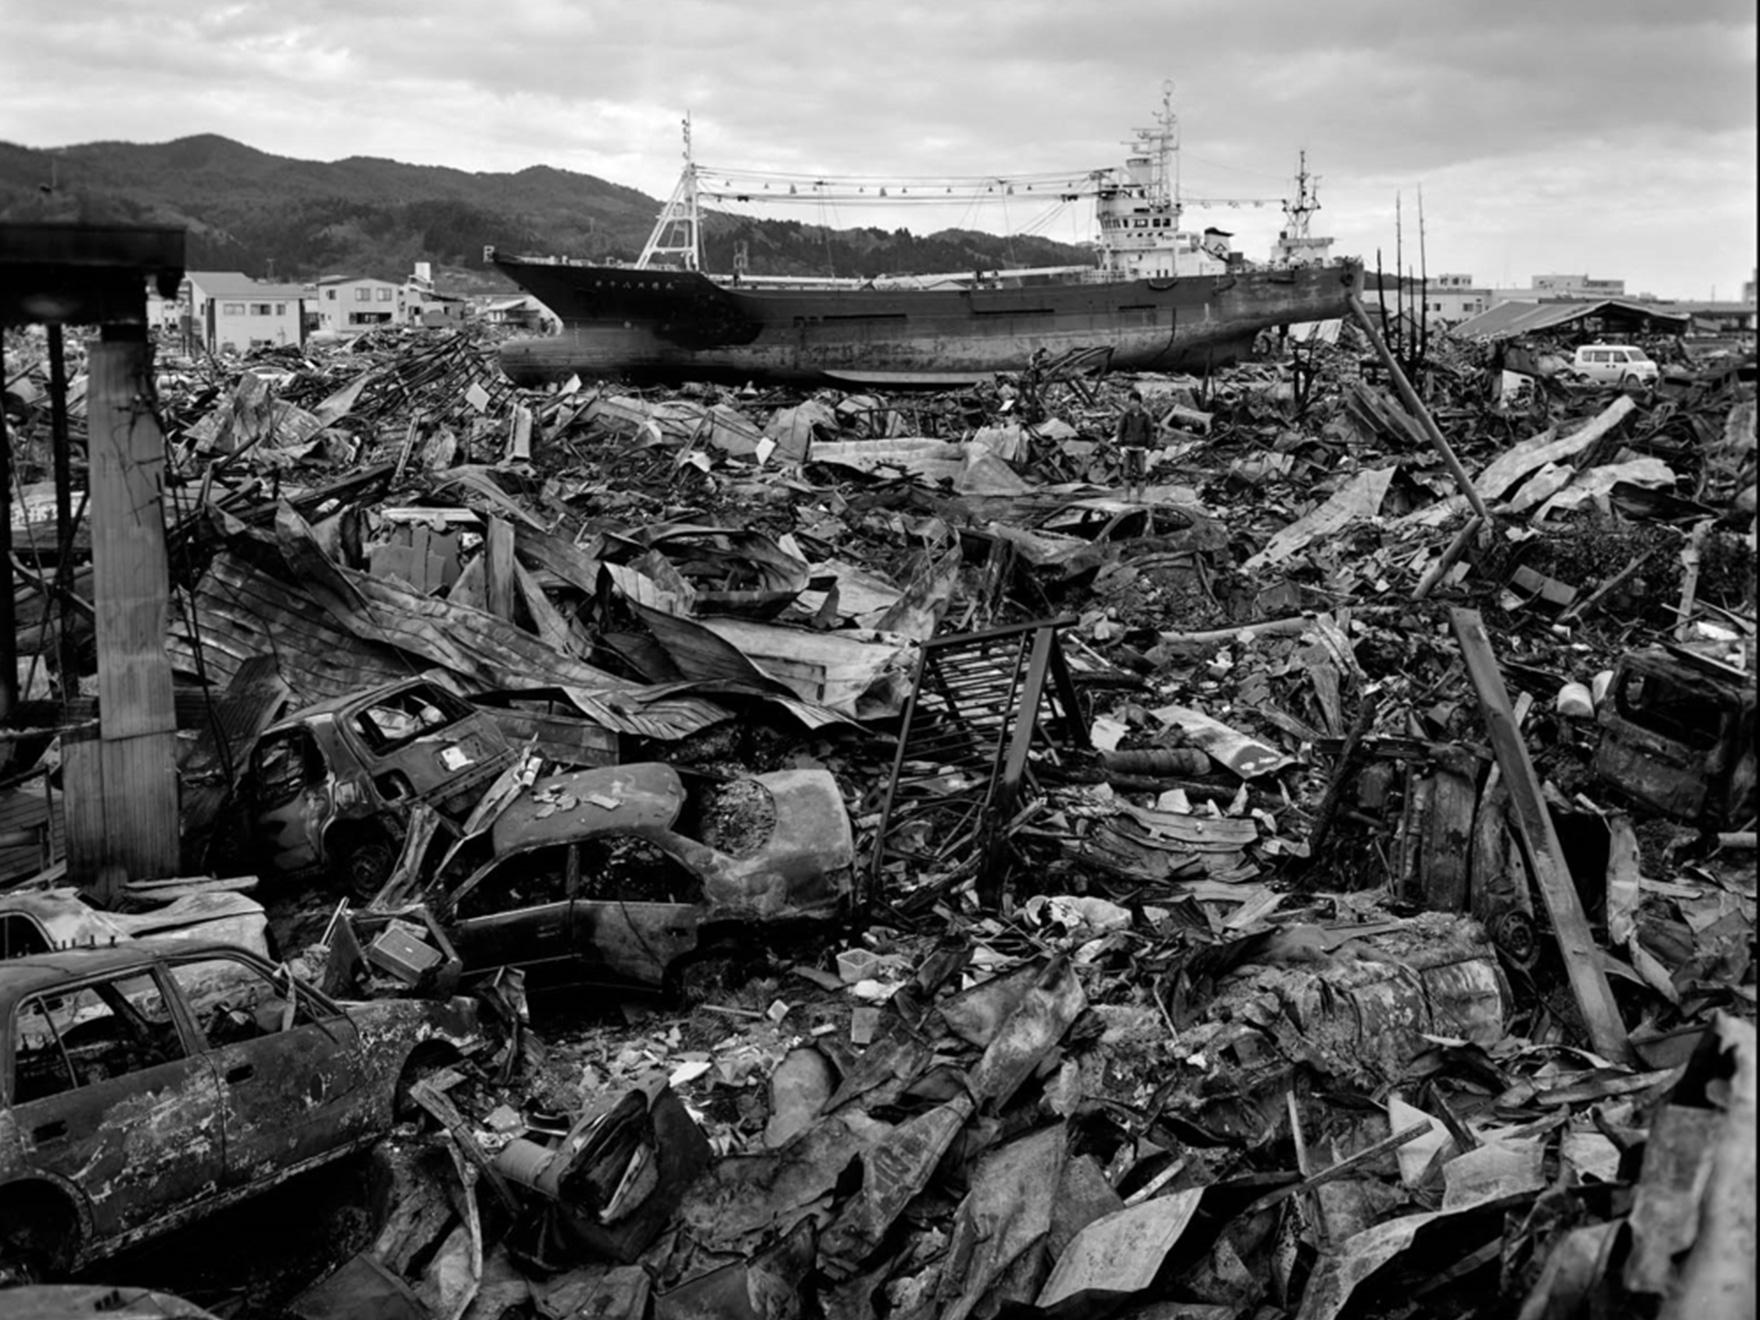 Kōzō Miyoshi, 2011:04:03, Nishiminato, Kesennuma, Miyagi Prefecture from North East Earthquake Disaster Tsunami 2011 Portfolio, 2011